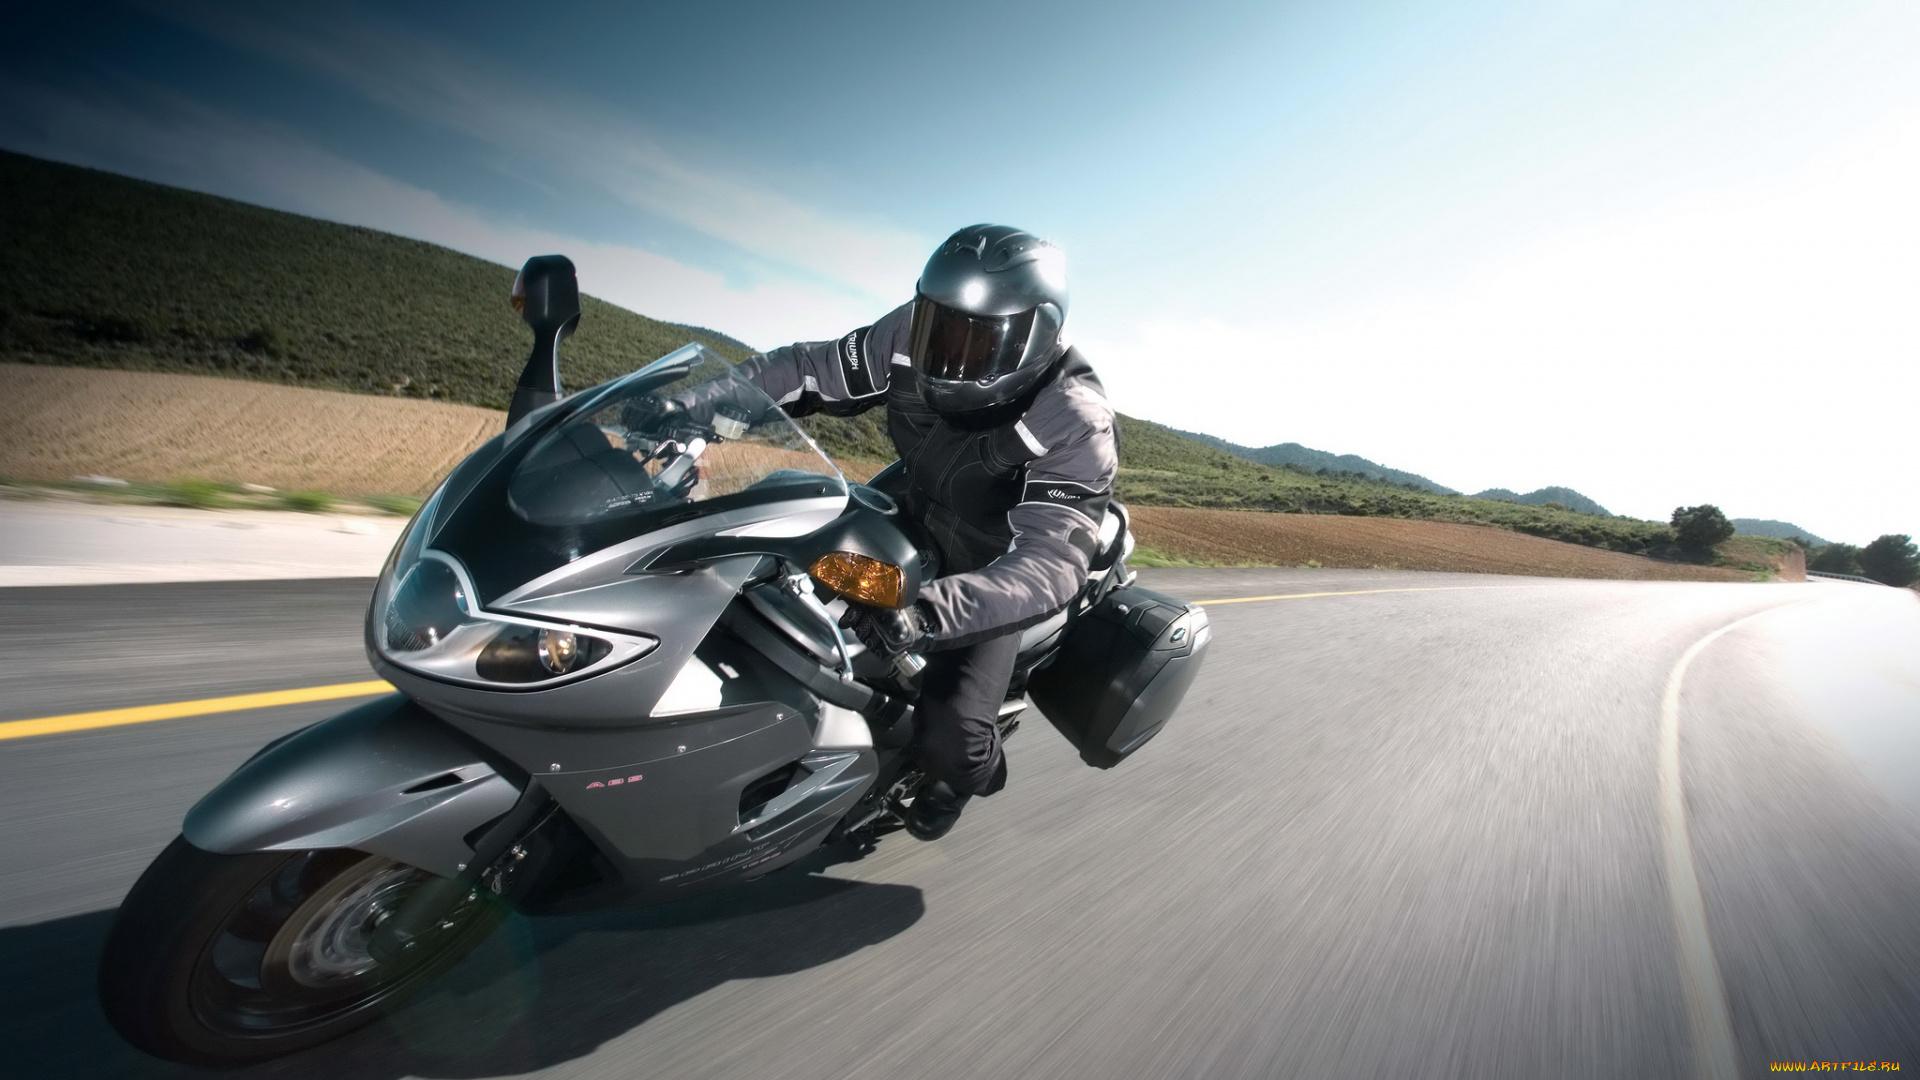 привлекают картинки мотоциклов с мотоциклистами вам